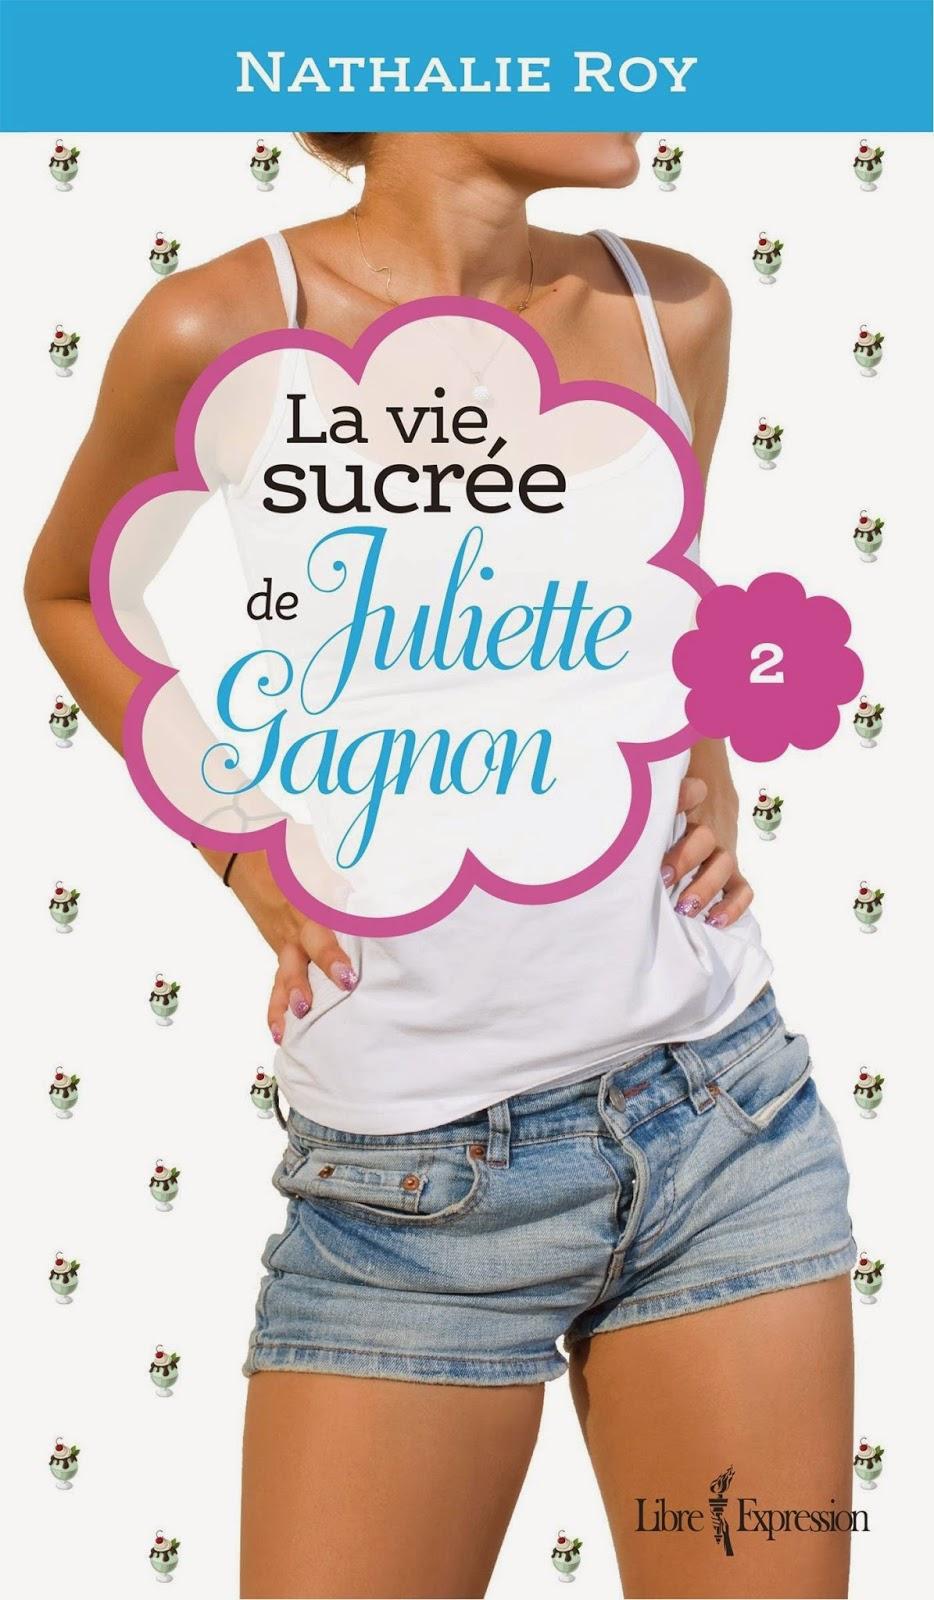 http://www.editions-libreexpression.com/vie-sucree-juliette-gagnon-tome-2/nathalie-roy/livre/9782764809907